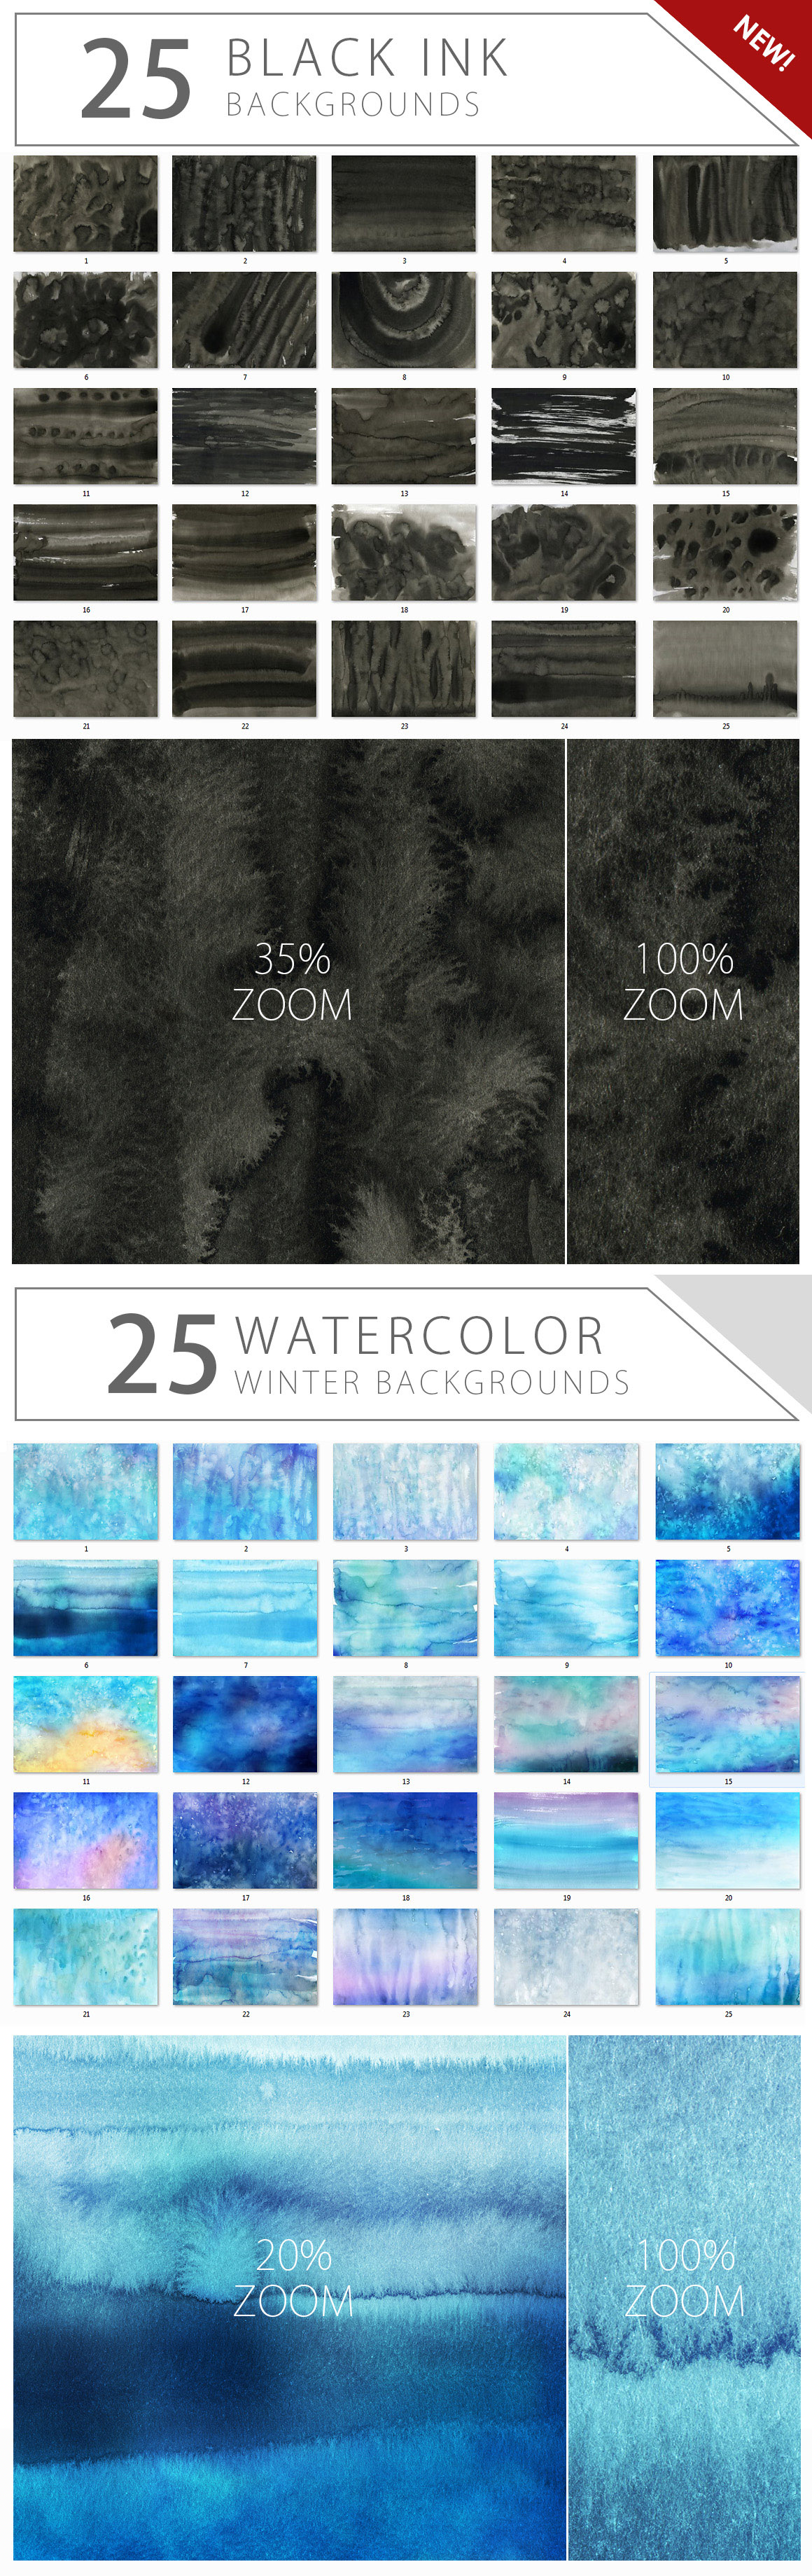 Supermassive Backgrounds Bundle example image 11